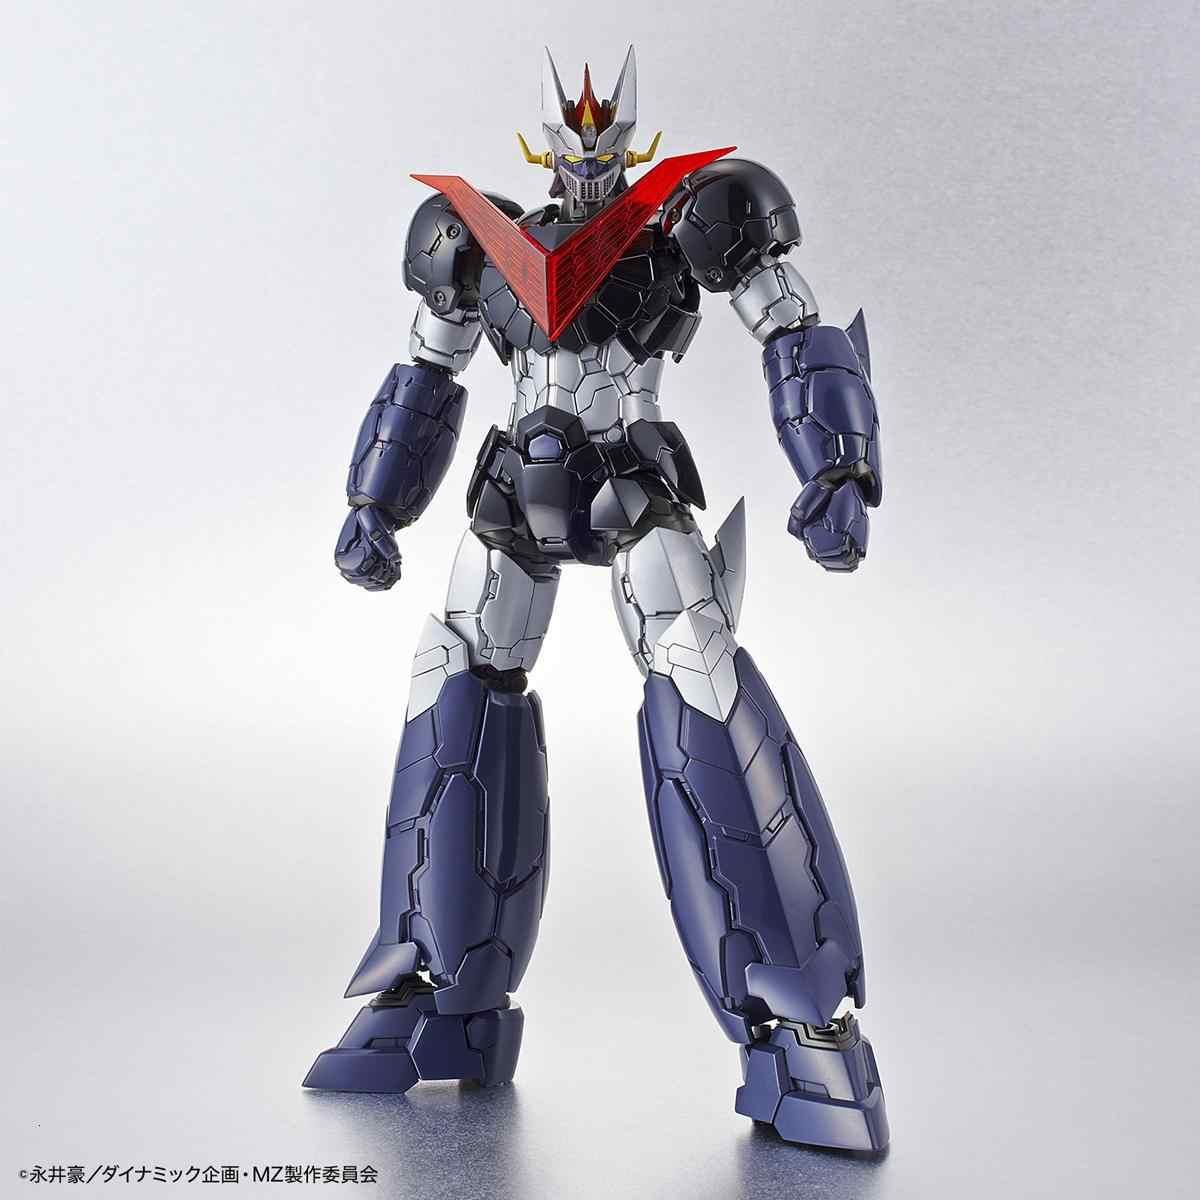 Bandai HG 1/144 büyük MAZINGER MAZINGER Z NFINITY VER Gundam mobil takım elbise monte Model kitleri aksiyon figürleri plastik Model oyuncaklar